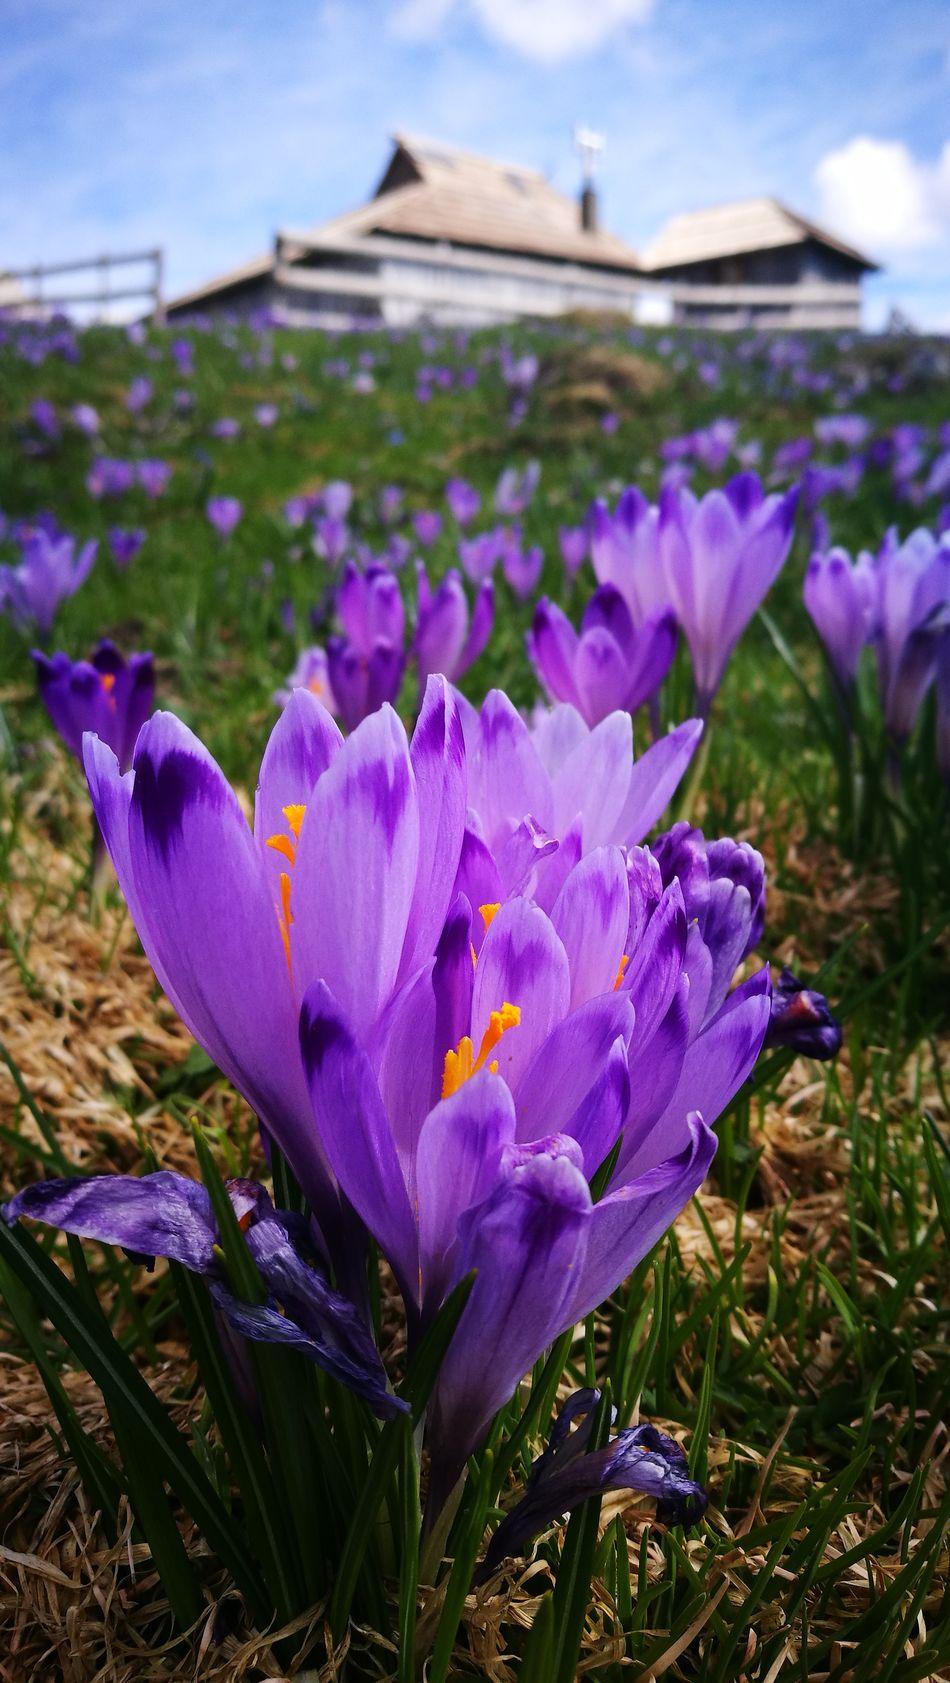 Flower Beauty In Nature Nature Crocus Crocus flavus #wildflowers #guadarrama #primavera #spring #flores nature mountain Velika Planina Slovenia Slovenian Alps